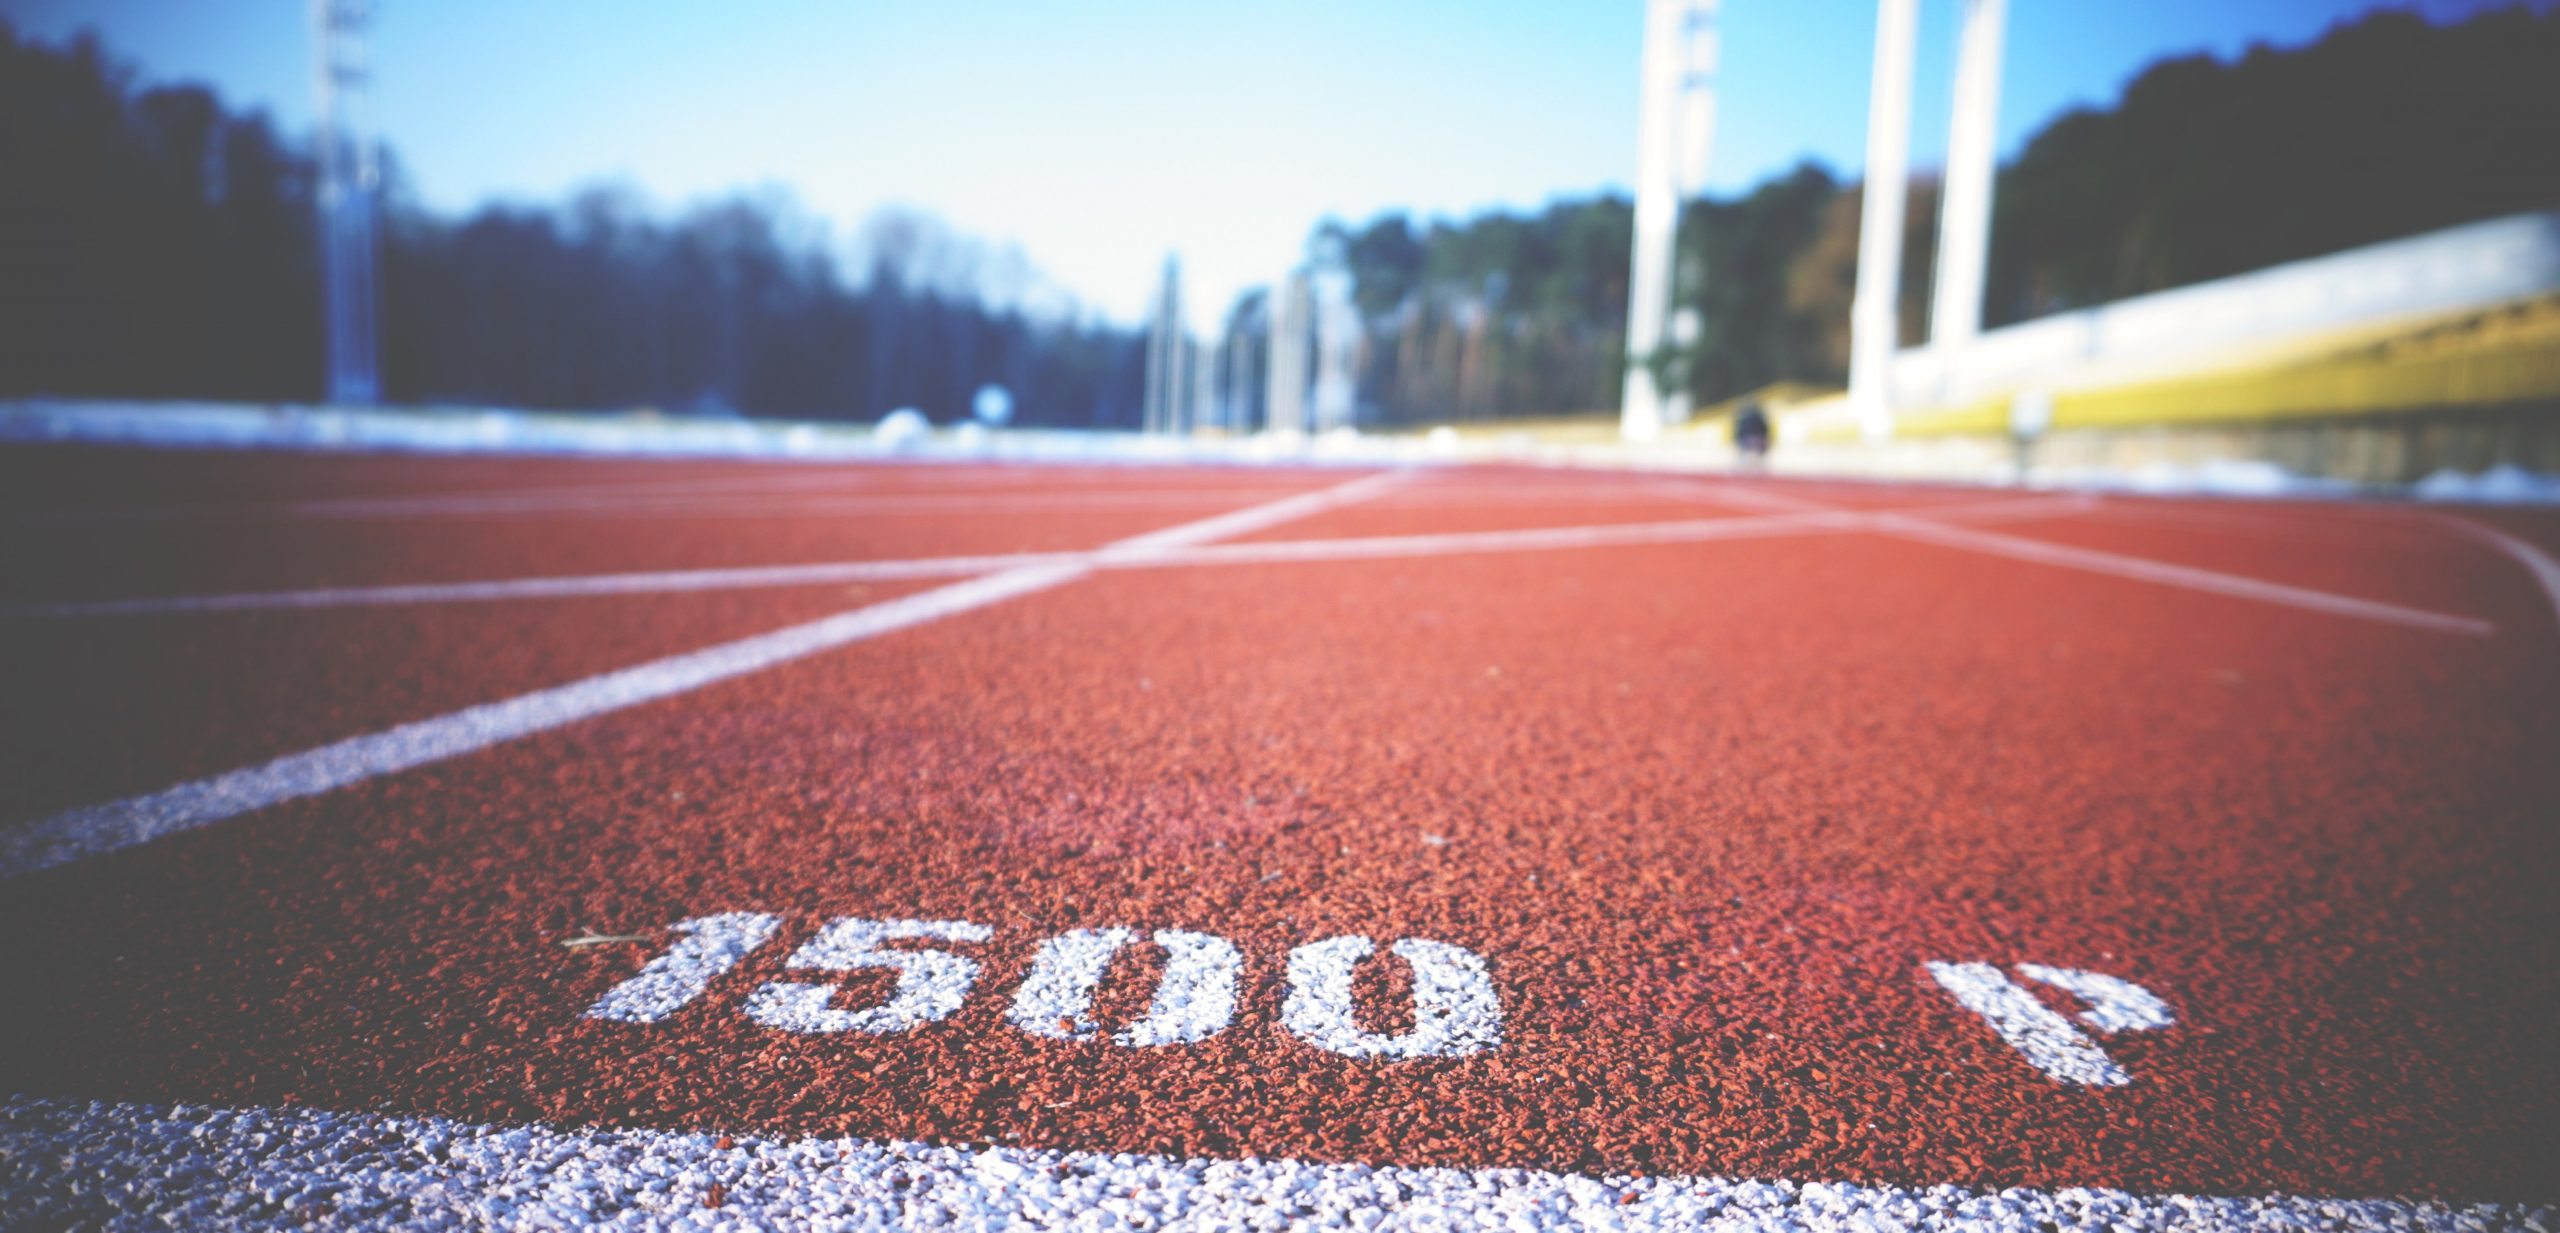 asphalt athletics blur close up 401896 scaled - asphalt-athletics-blur-close-up-401896